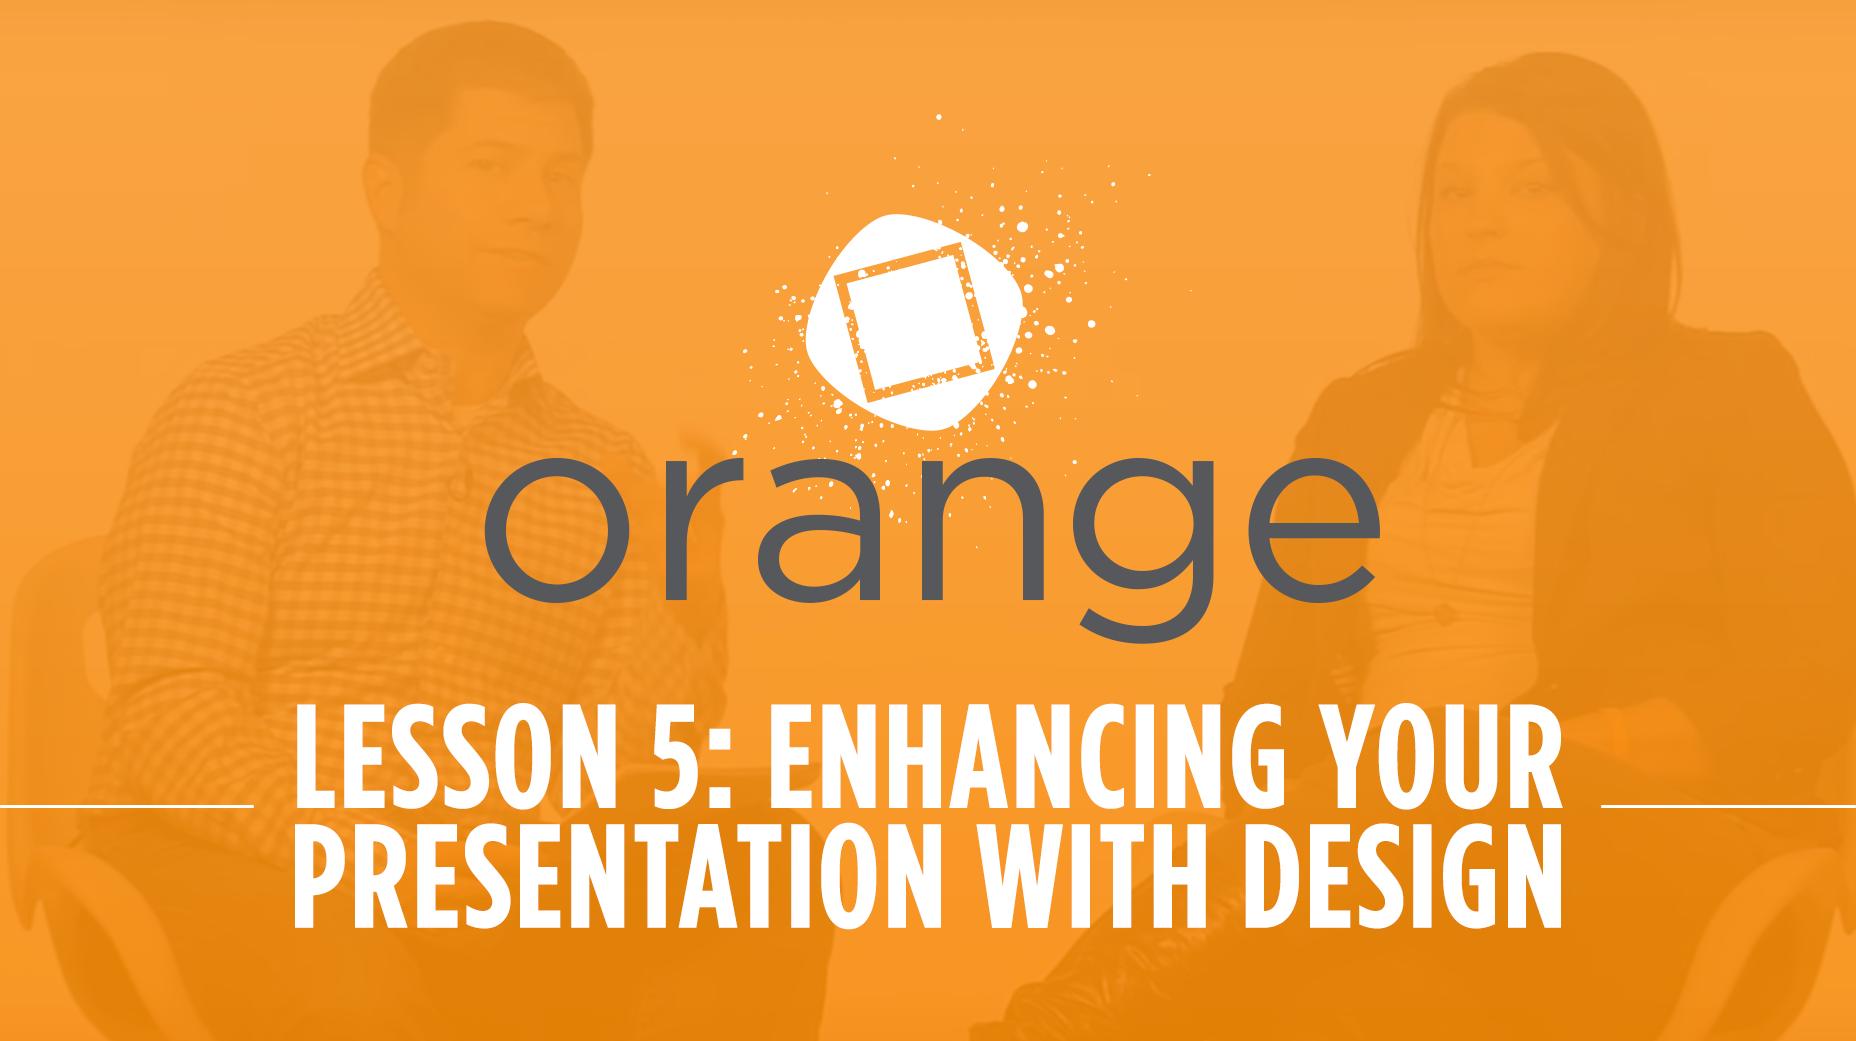 Orange – Lesson 5: Enhancing Your Presentation With Design